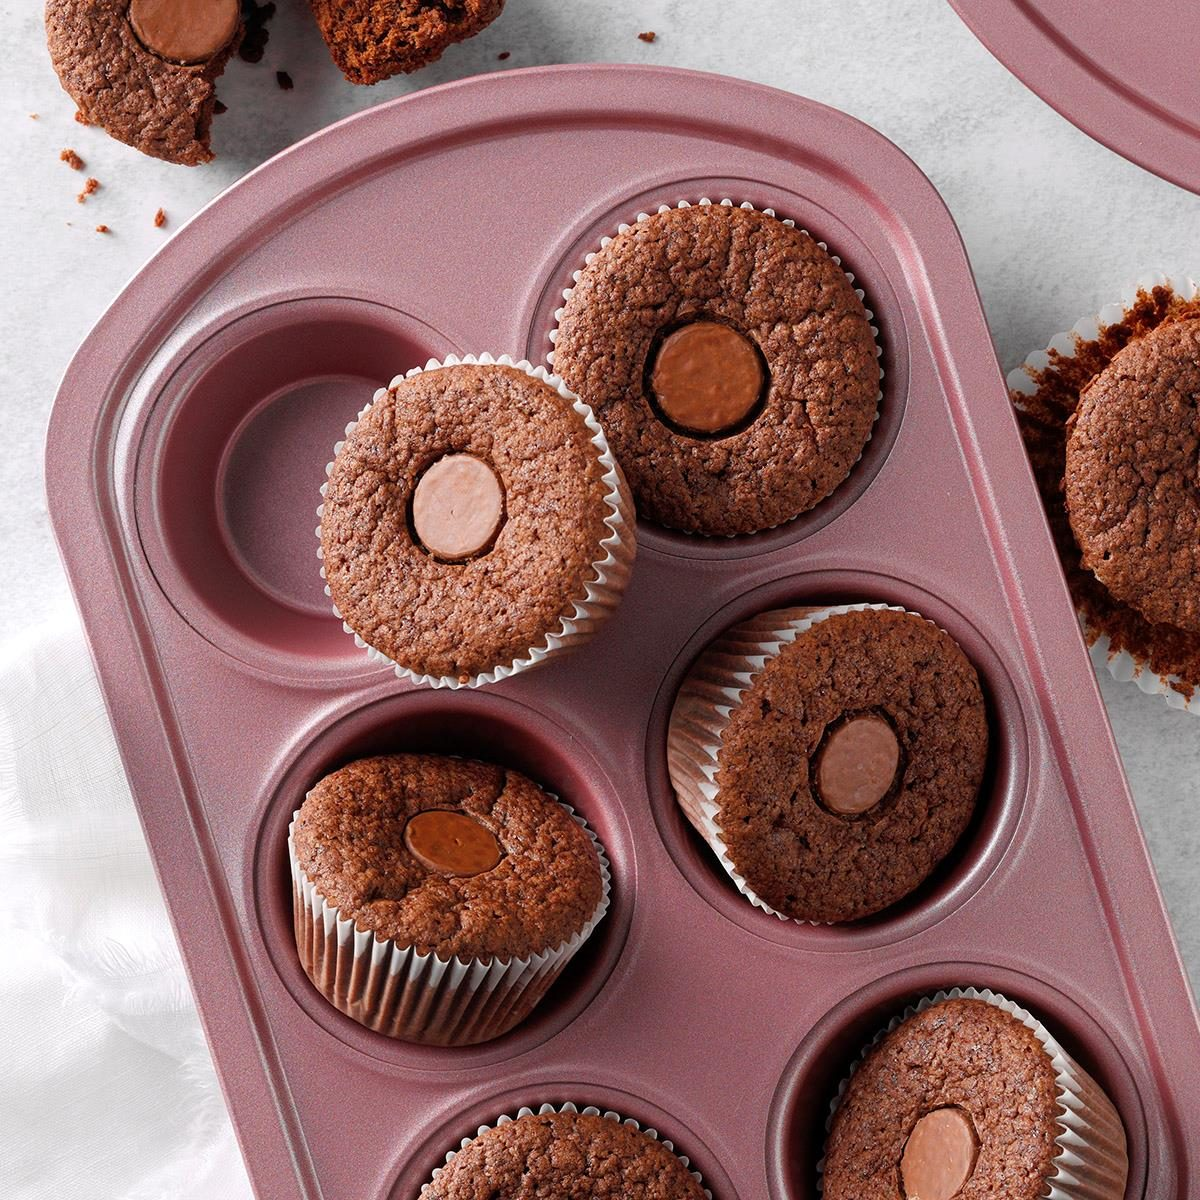 Brownie Kiss Cupcakes Exps Tohfm16 9284 B09 22 3b 1